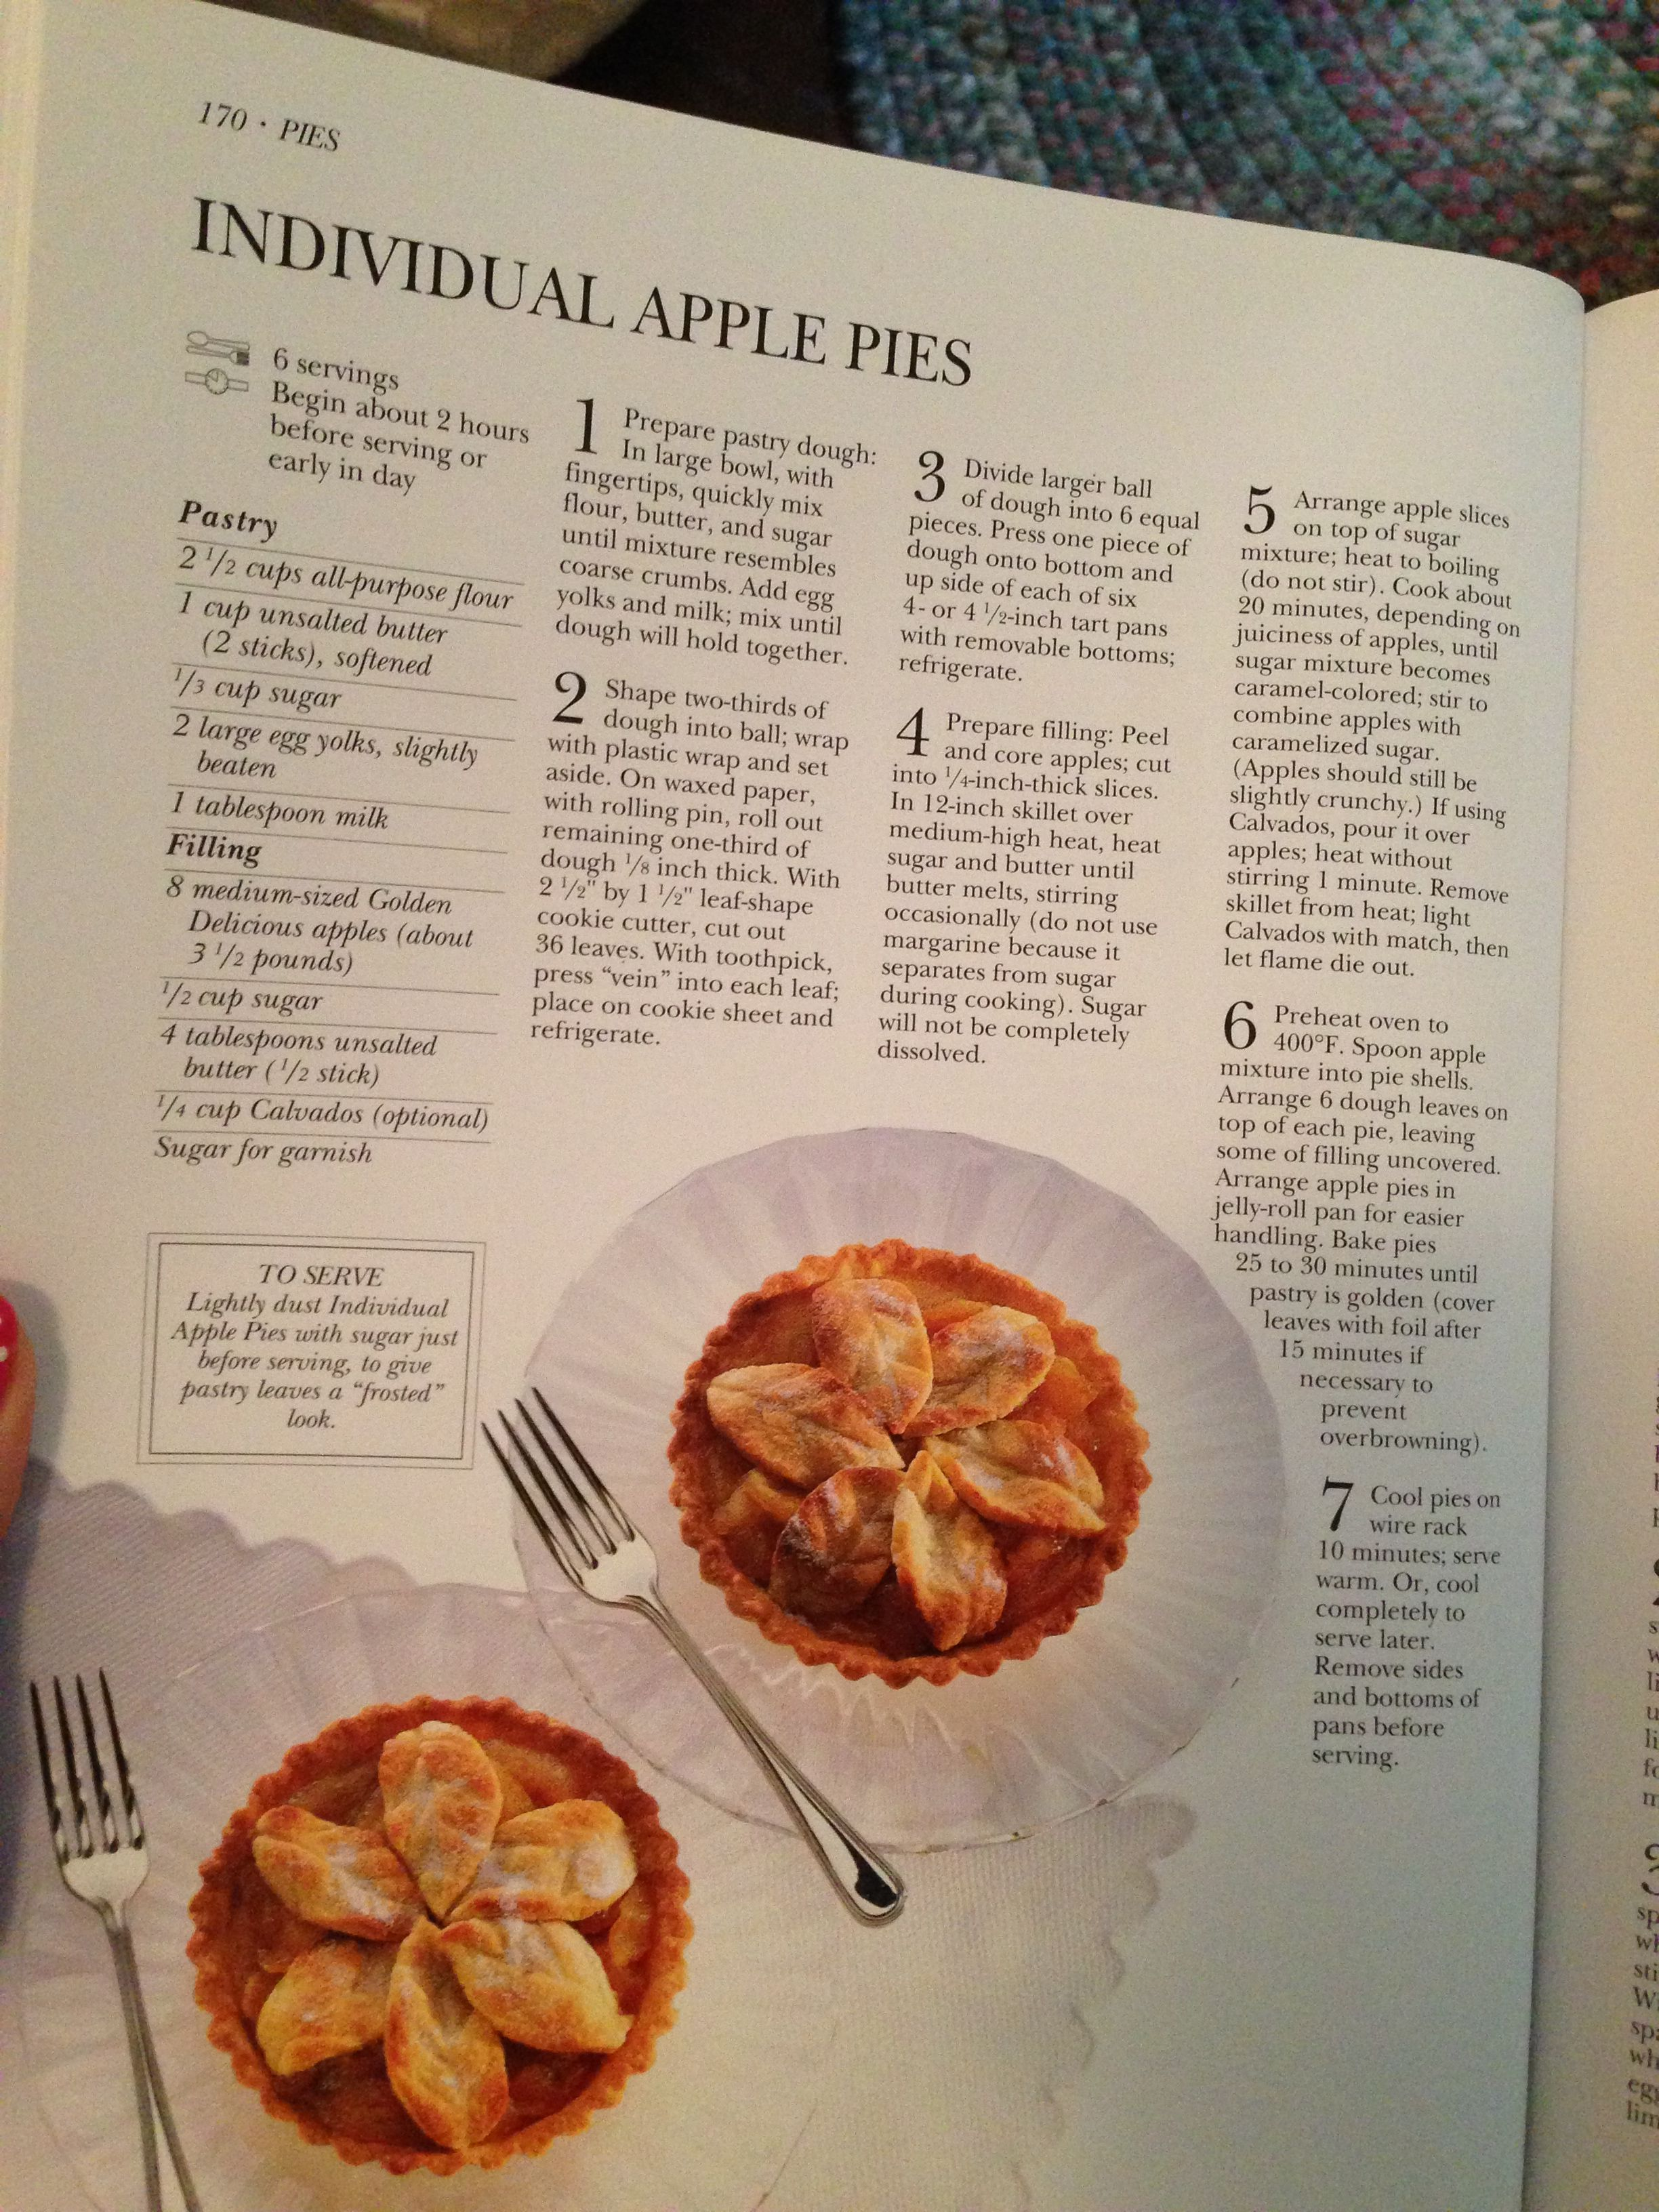 Individual Apple Pies | Yum! | Pinterest